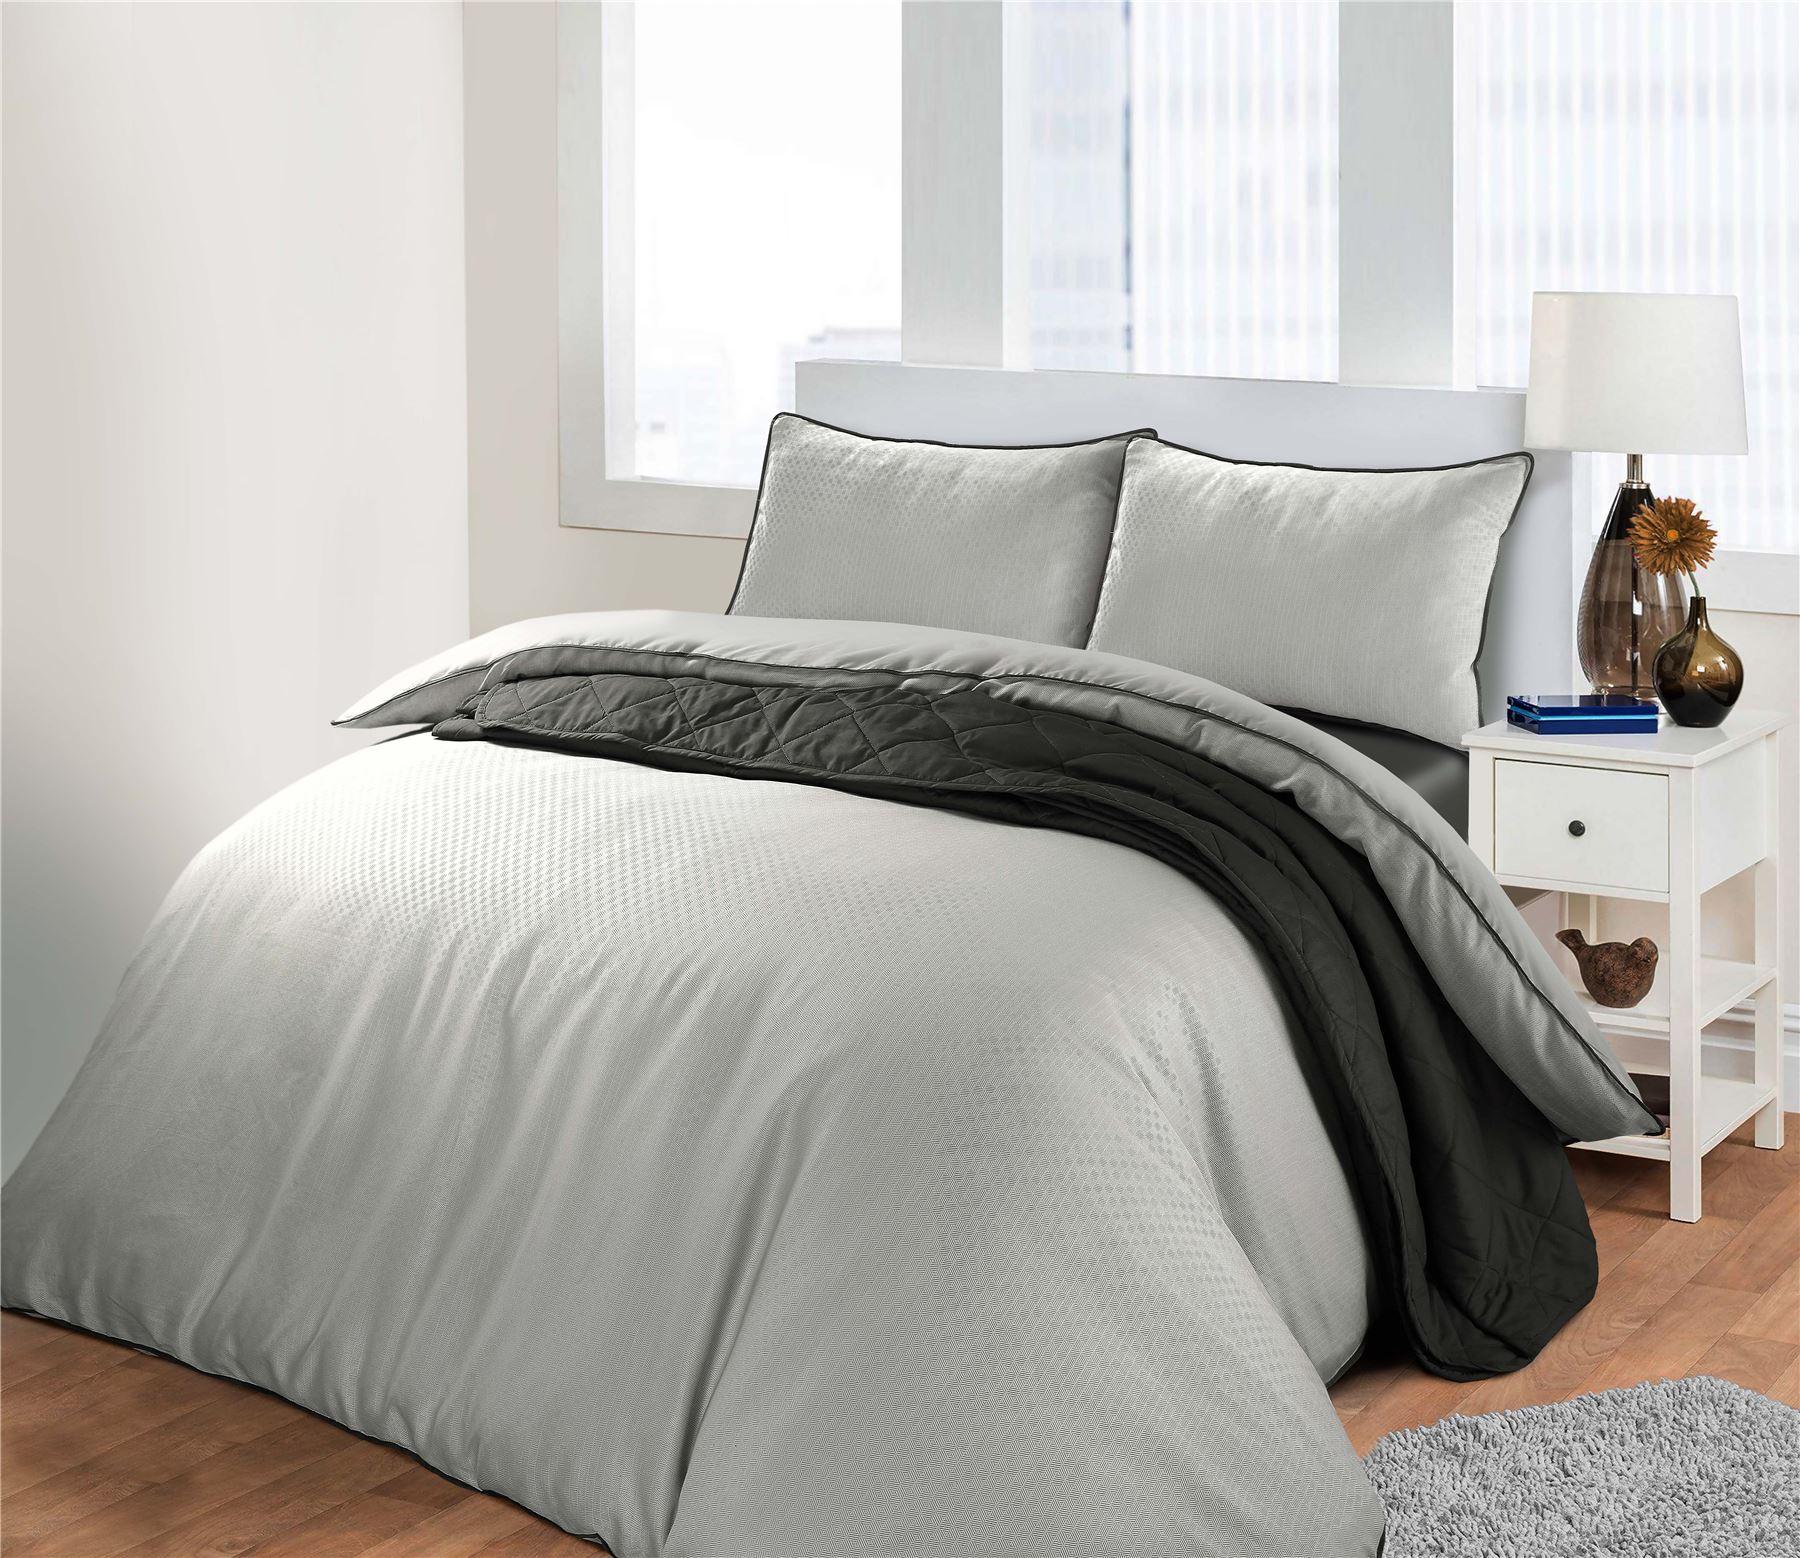 Sleepdown WAFFLE Polycotton Reversible Duvet Cover Set with Pillowcases